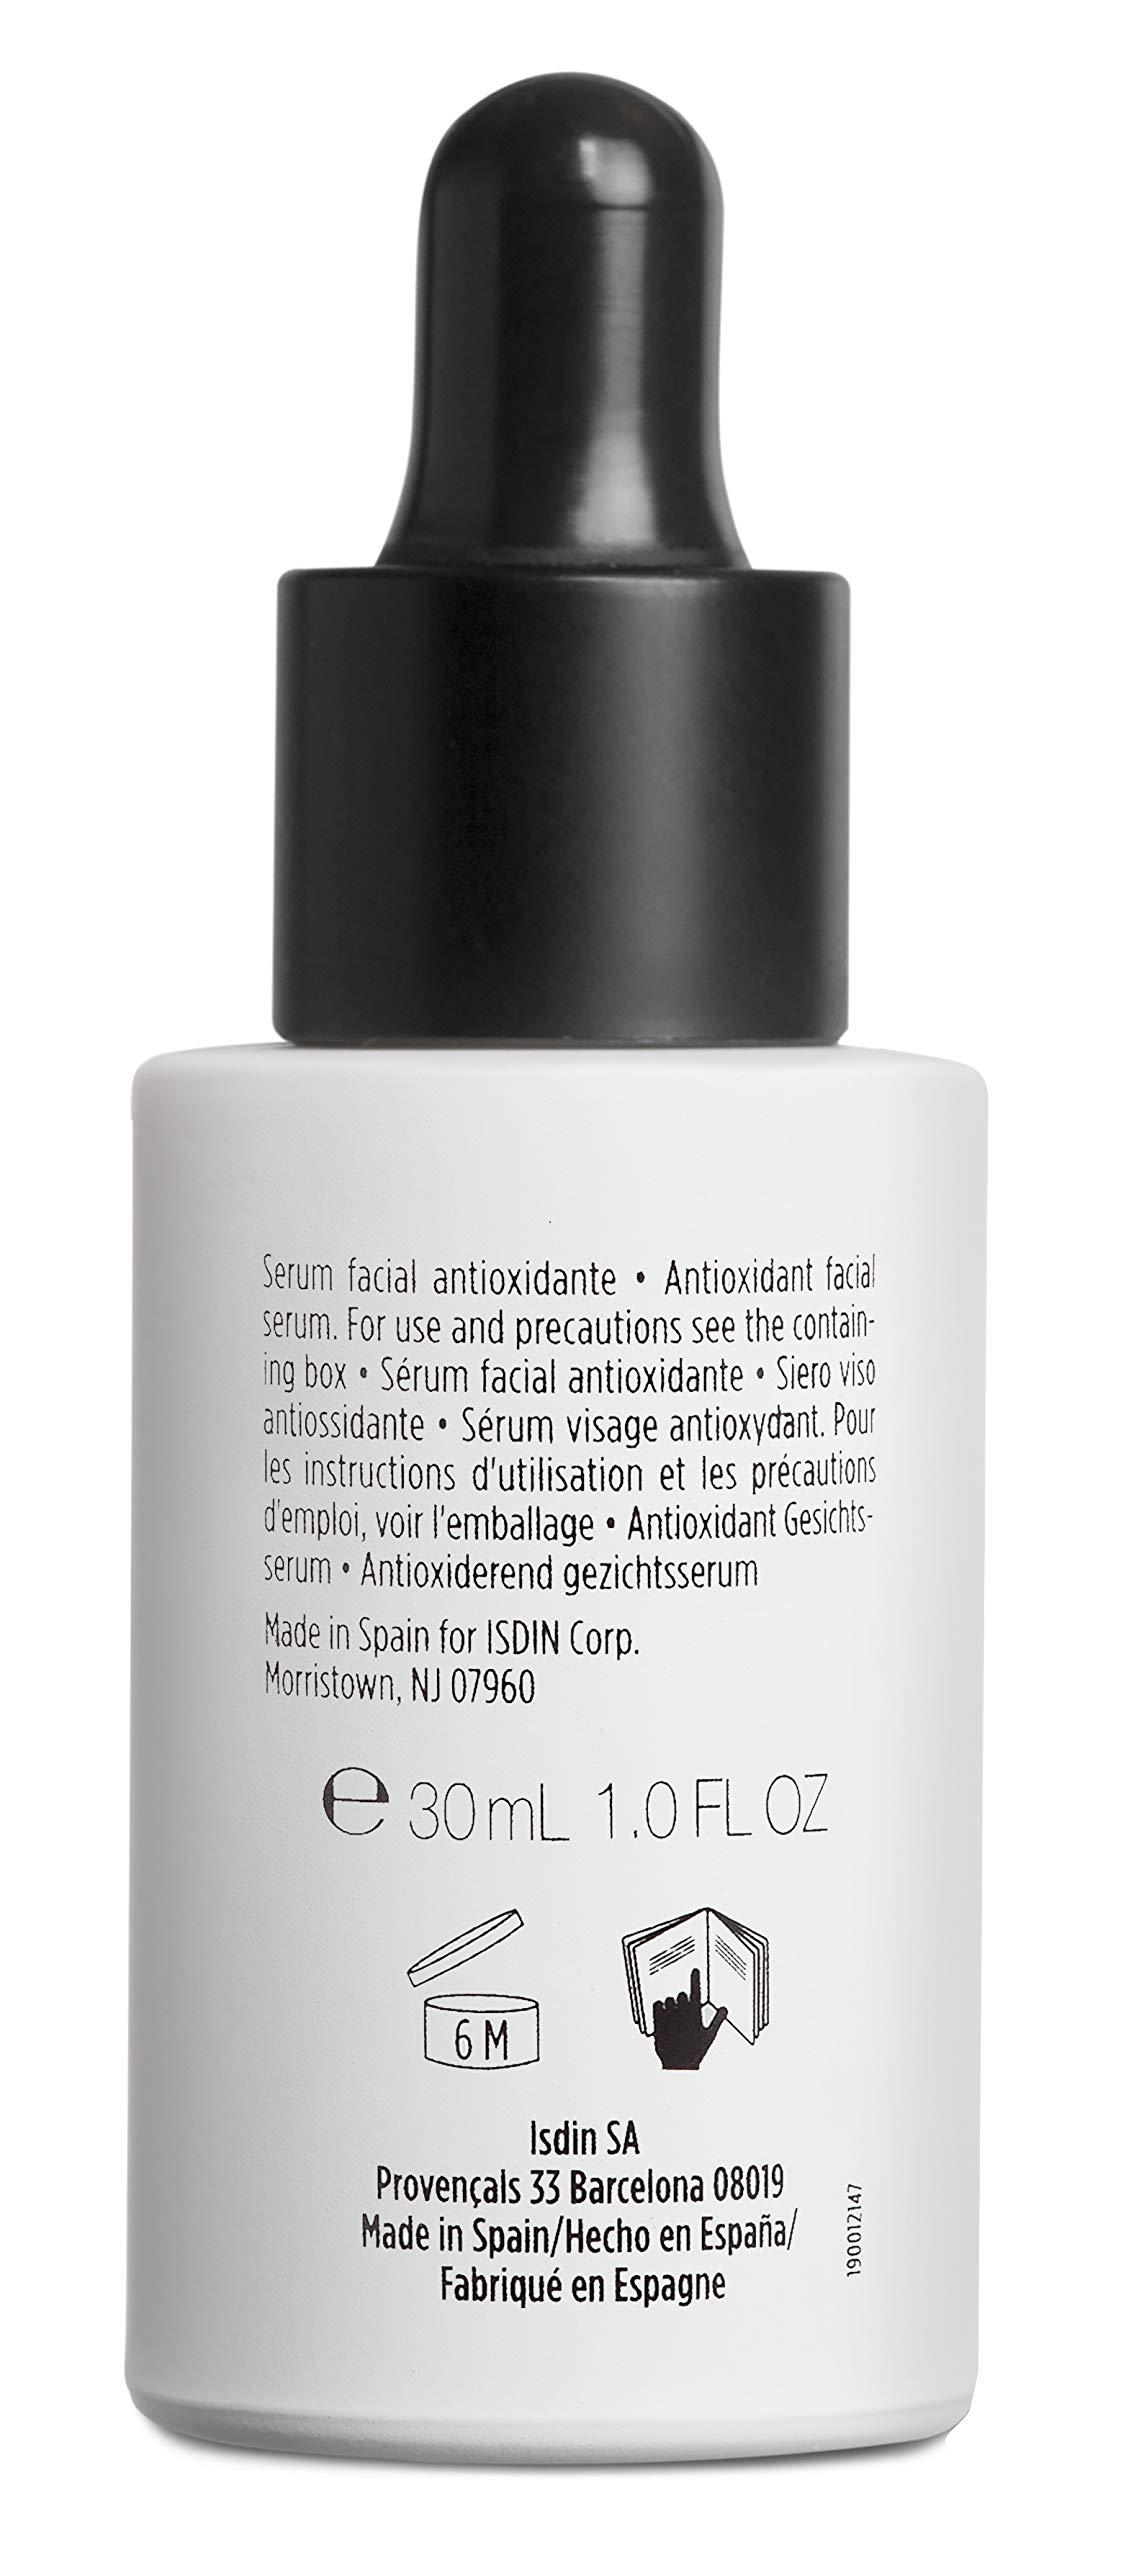 Isdin Isdinceutics Flavo-C Potente Serum Antioxidante   Piel Rejuvenecida y Luminosa 1 x 30ml